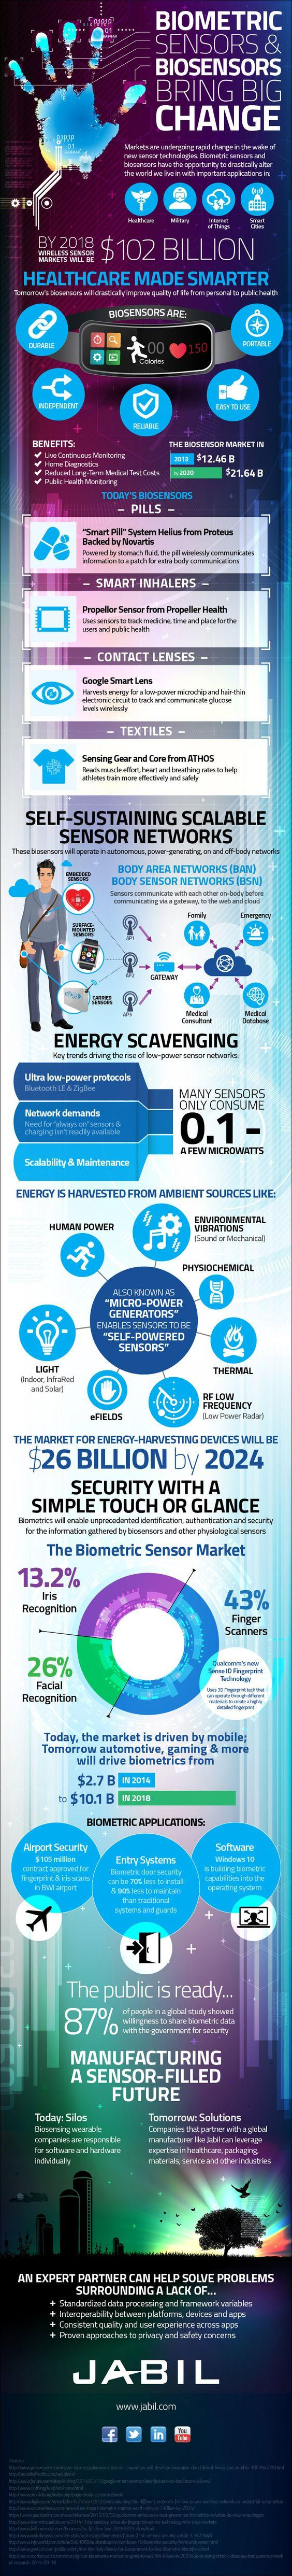 Emerging Technologies Bio Sensors